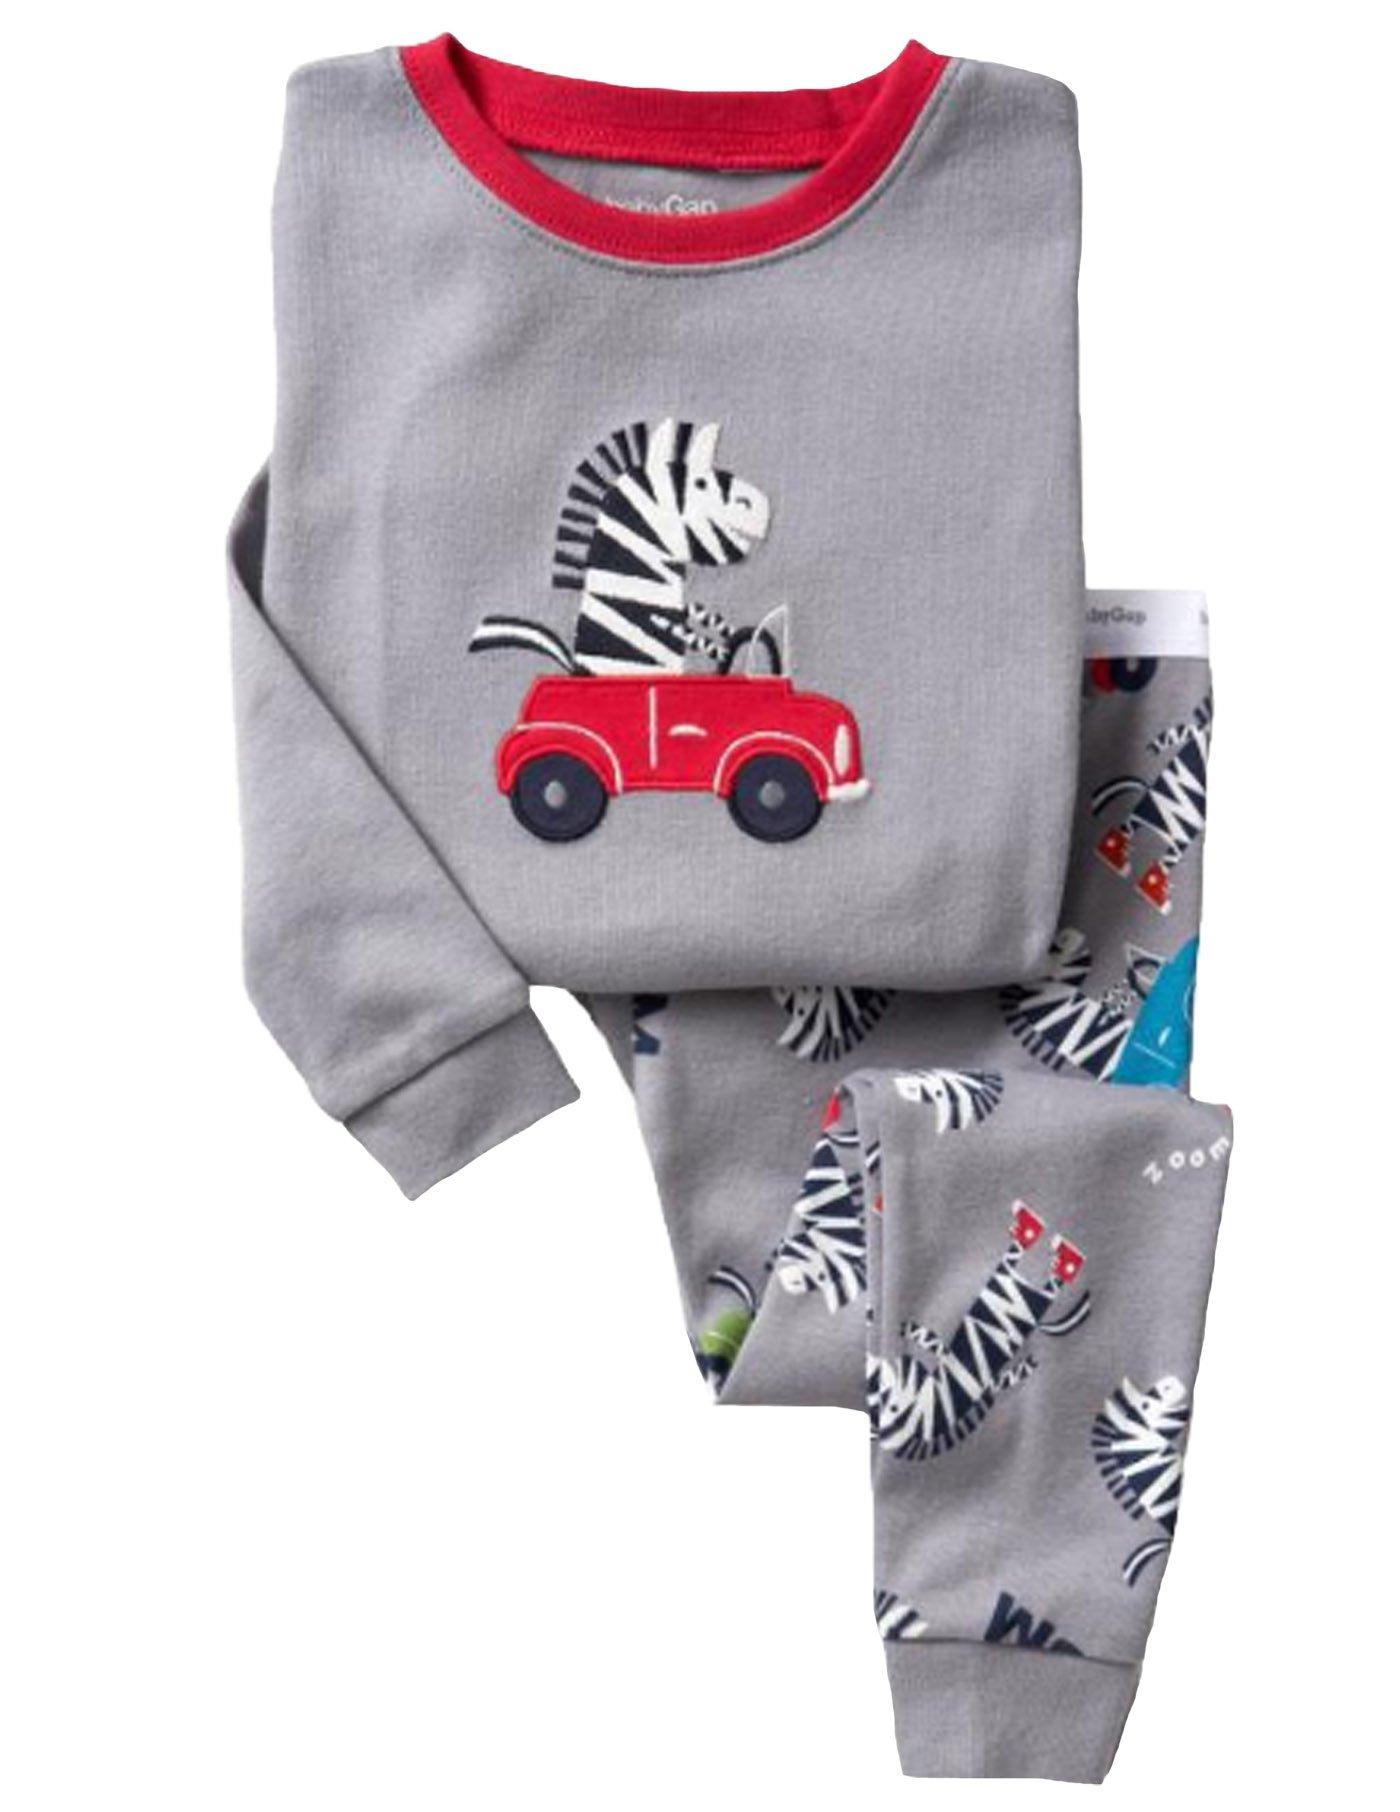 Car Pattern Boy Long Sleeves Pajamas Set 2 Piece 100% Cotton Clothes Toddler Kids Size 2T-7T